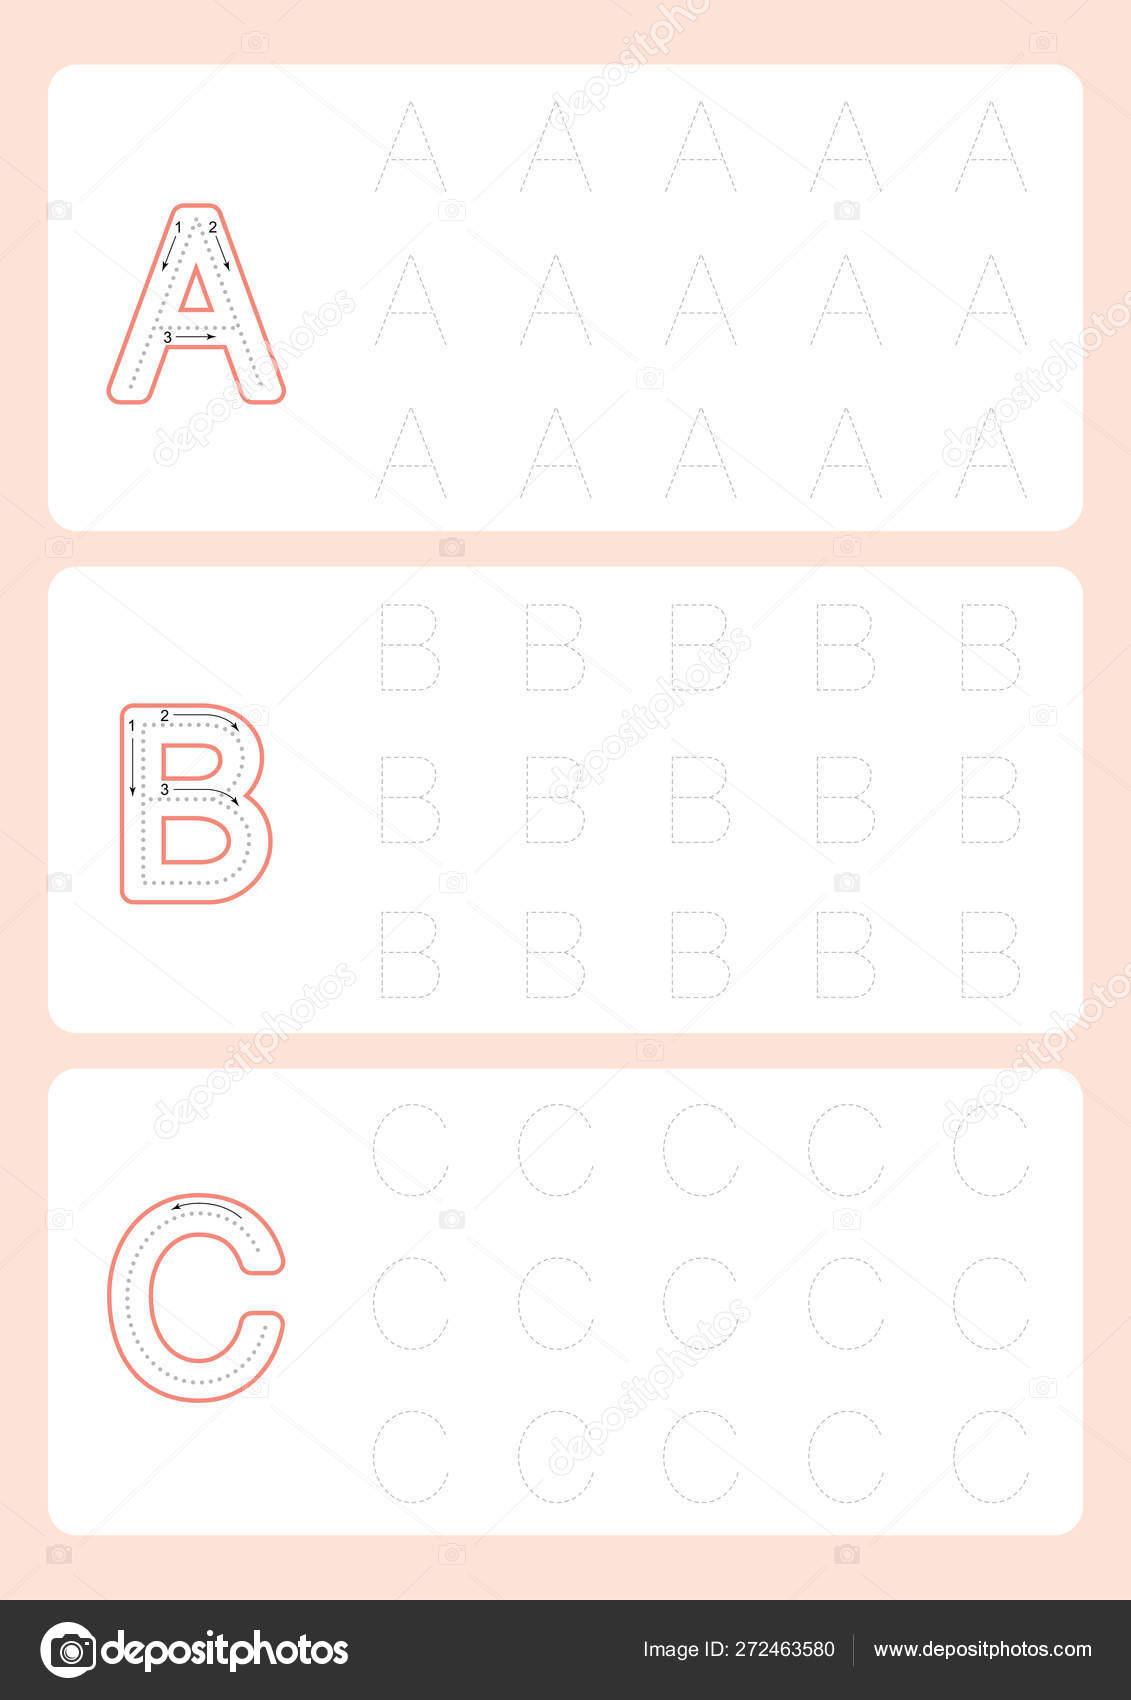 Kindergarten Tracing Letters Worksheets Alphabet Trace for Kindergarten Tracing Letters